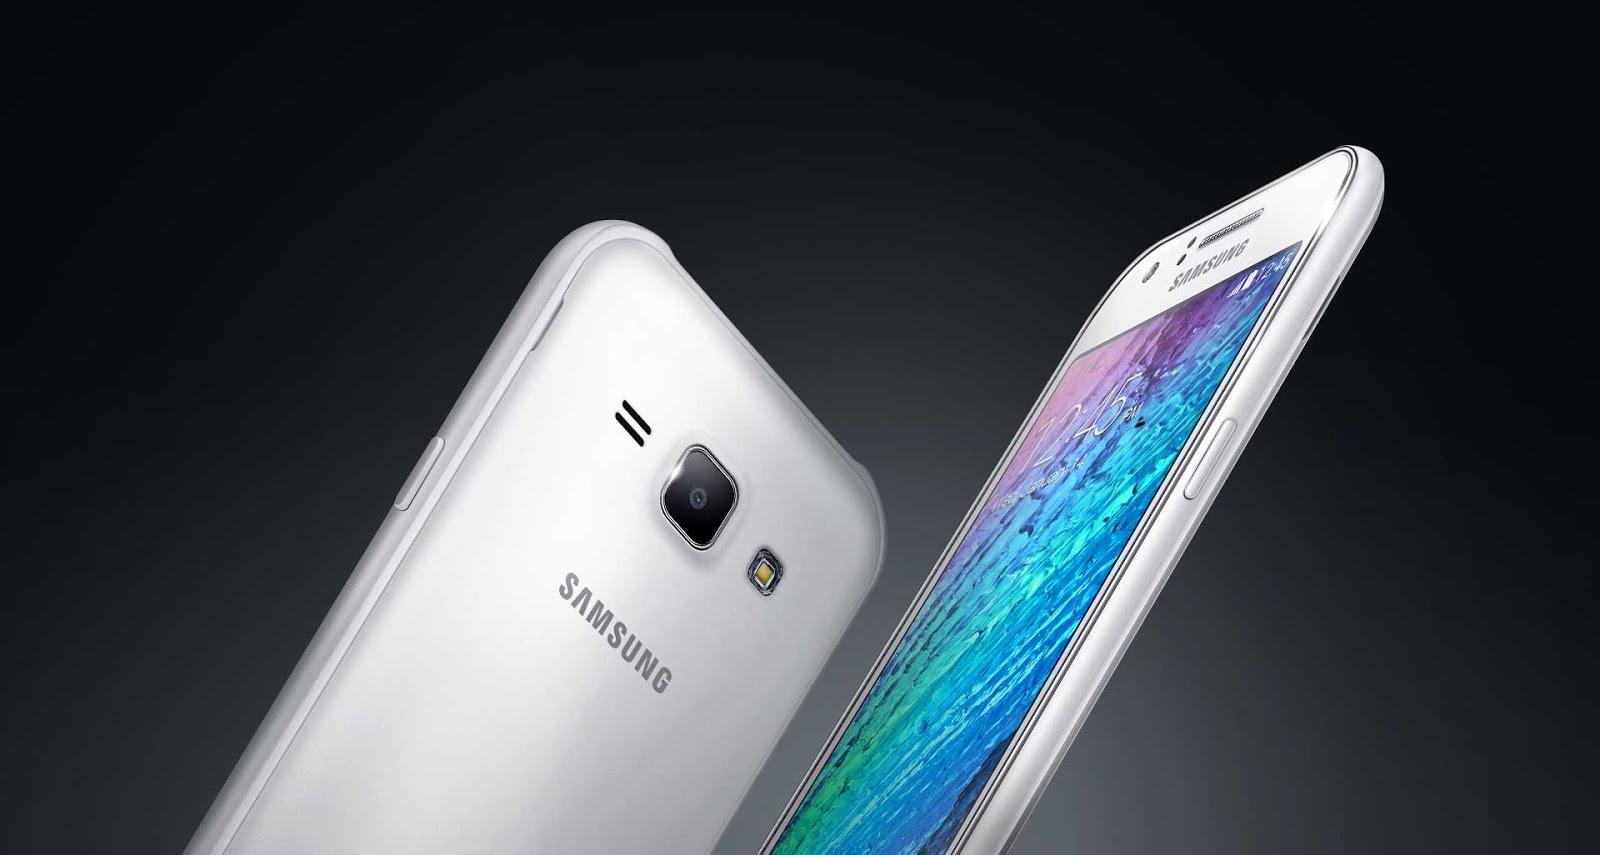 HP Samsung Terbaru Galaxy J1 Ace 4G